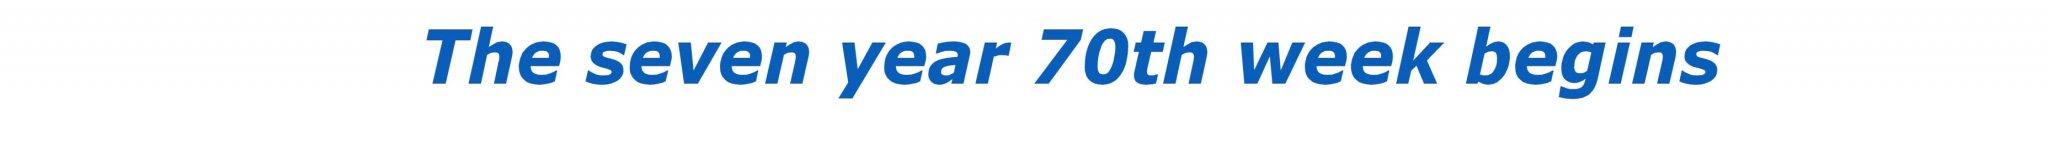 upload_2020-8-6_2-33-59.jpeg